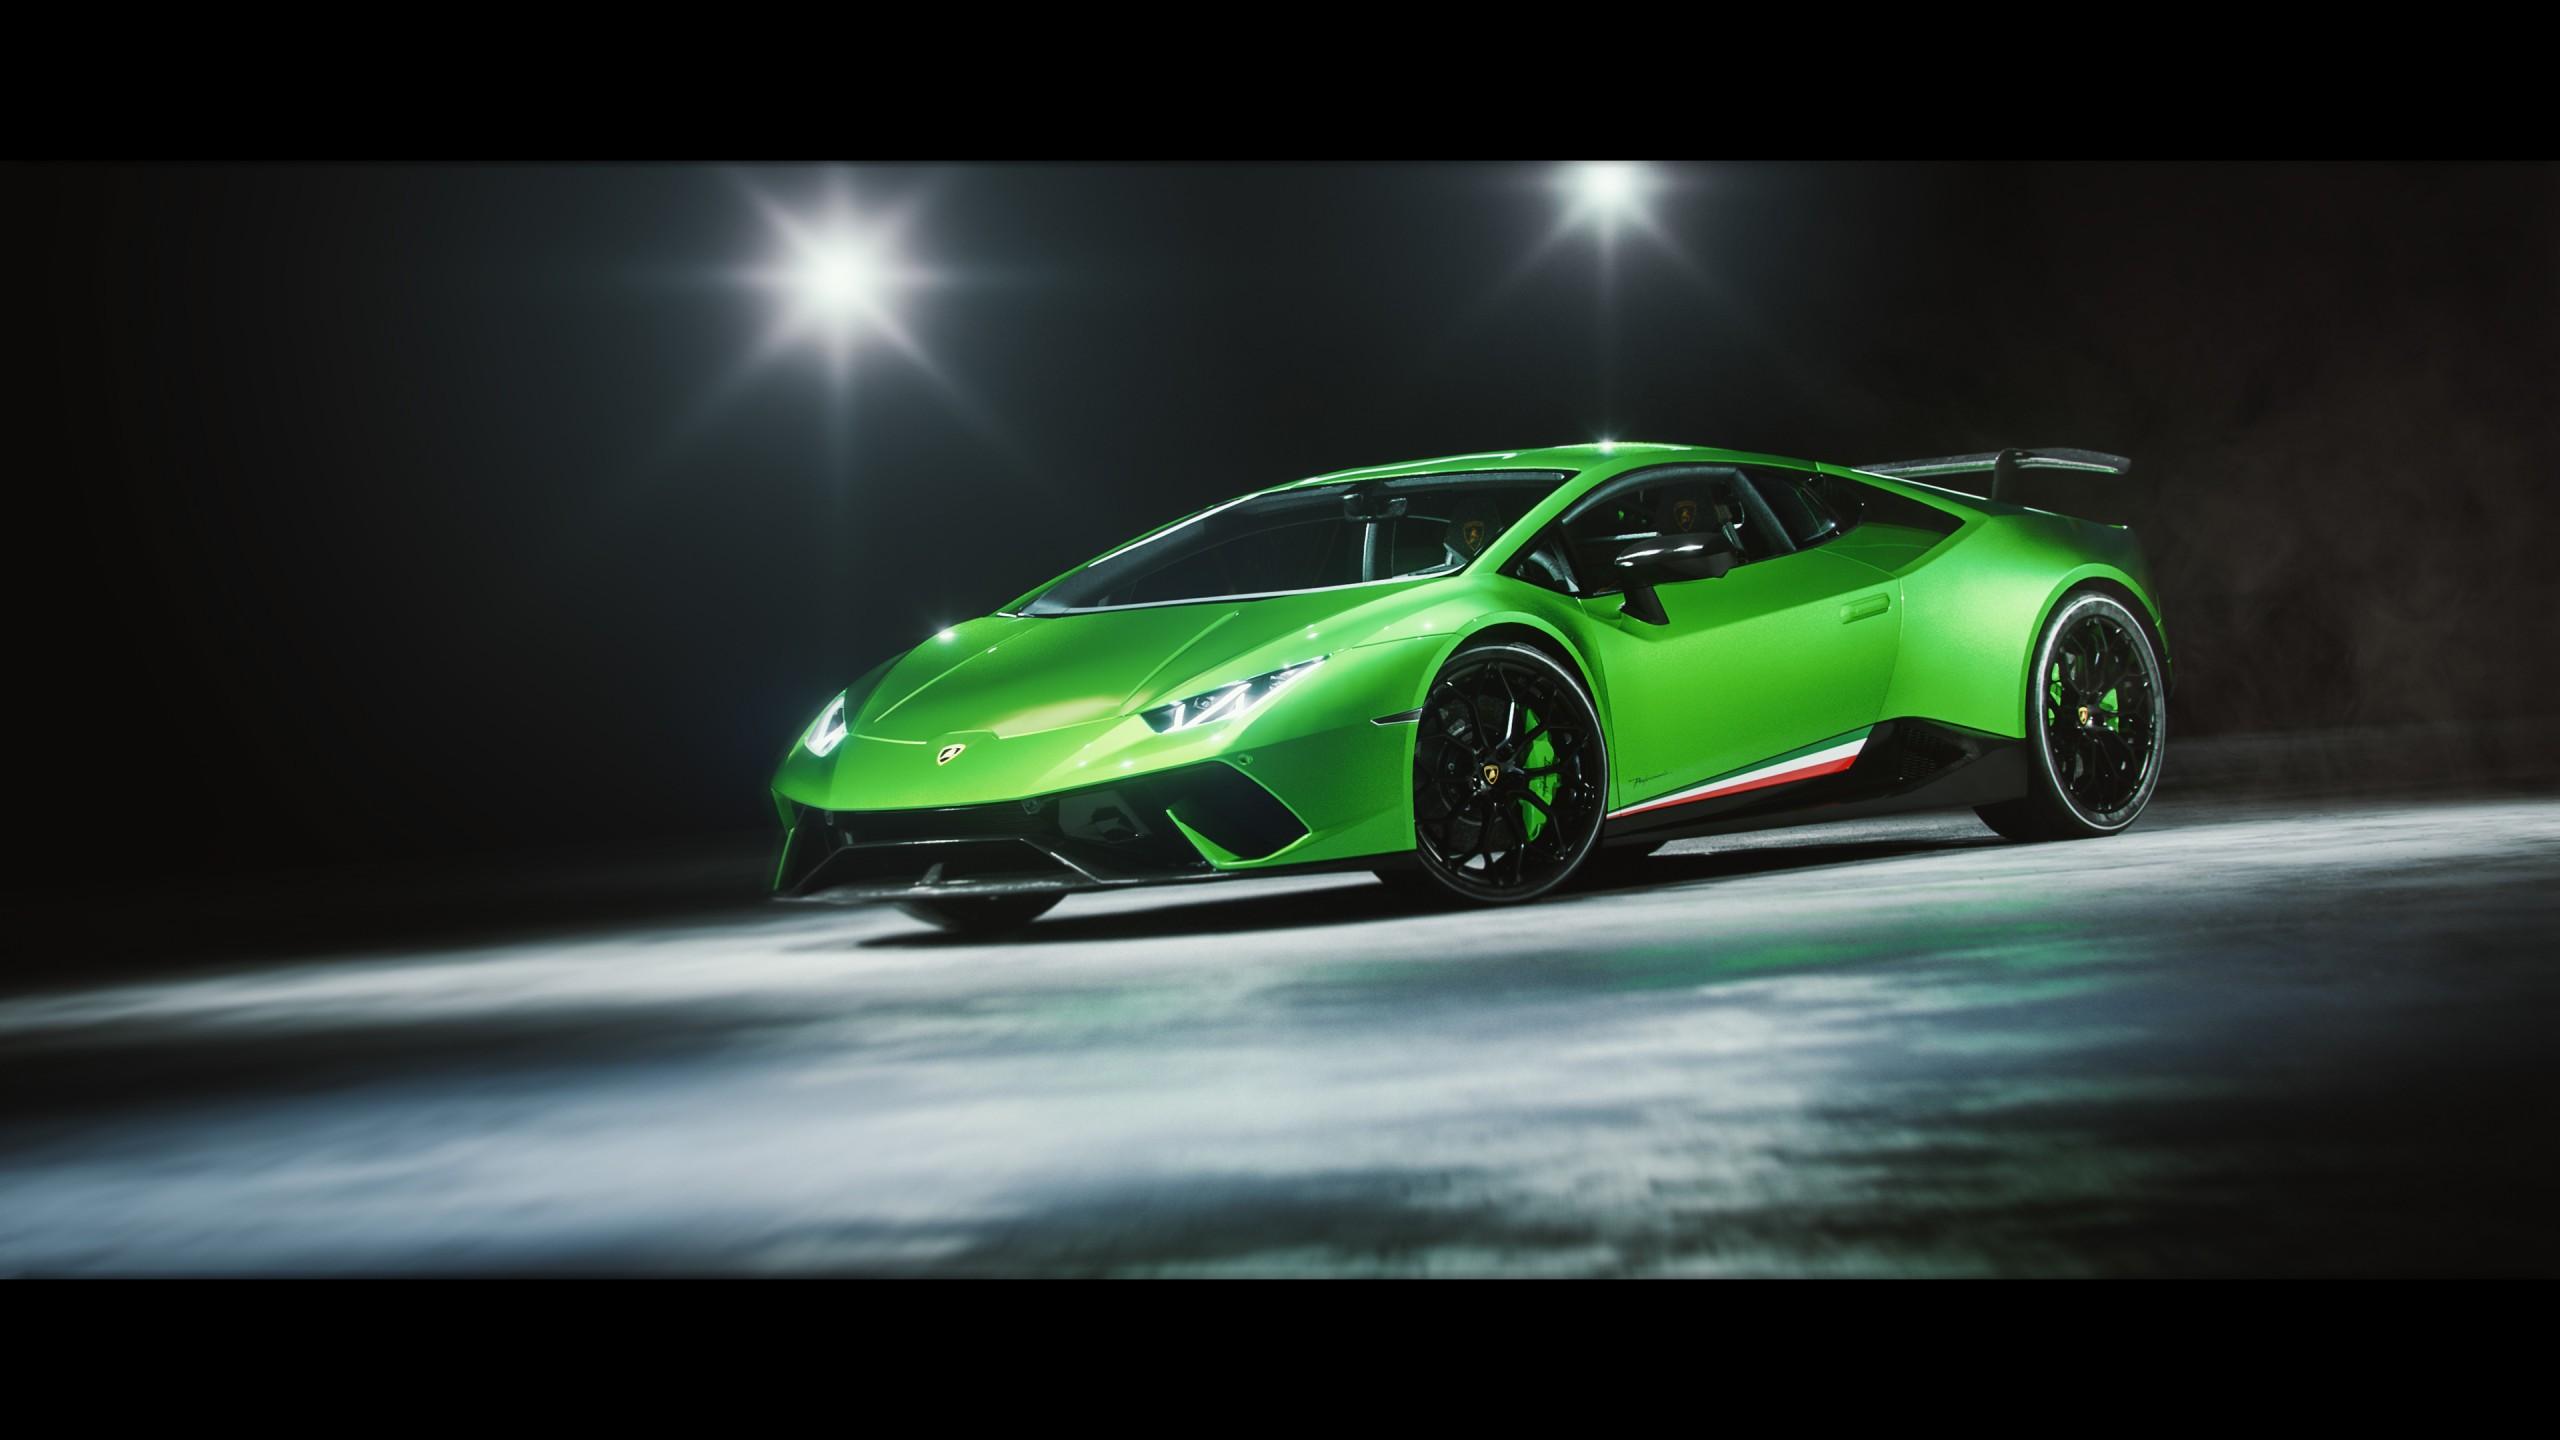 Lamborghini Huracan Performante >> Lamborghini Huracan Performante 4K Wallpaper | HD Car ...